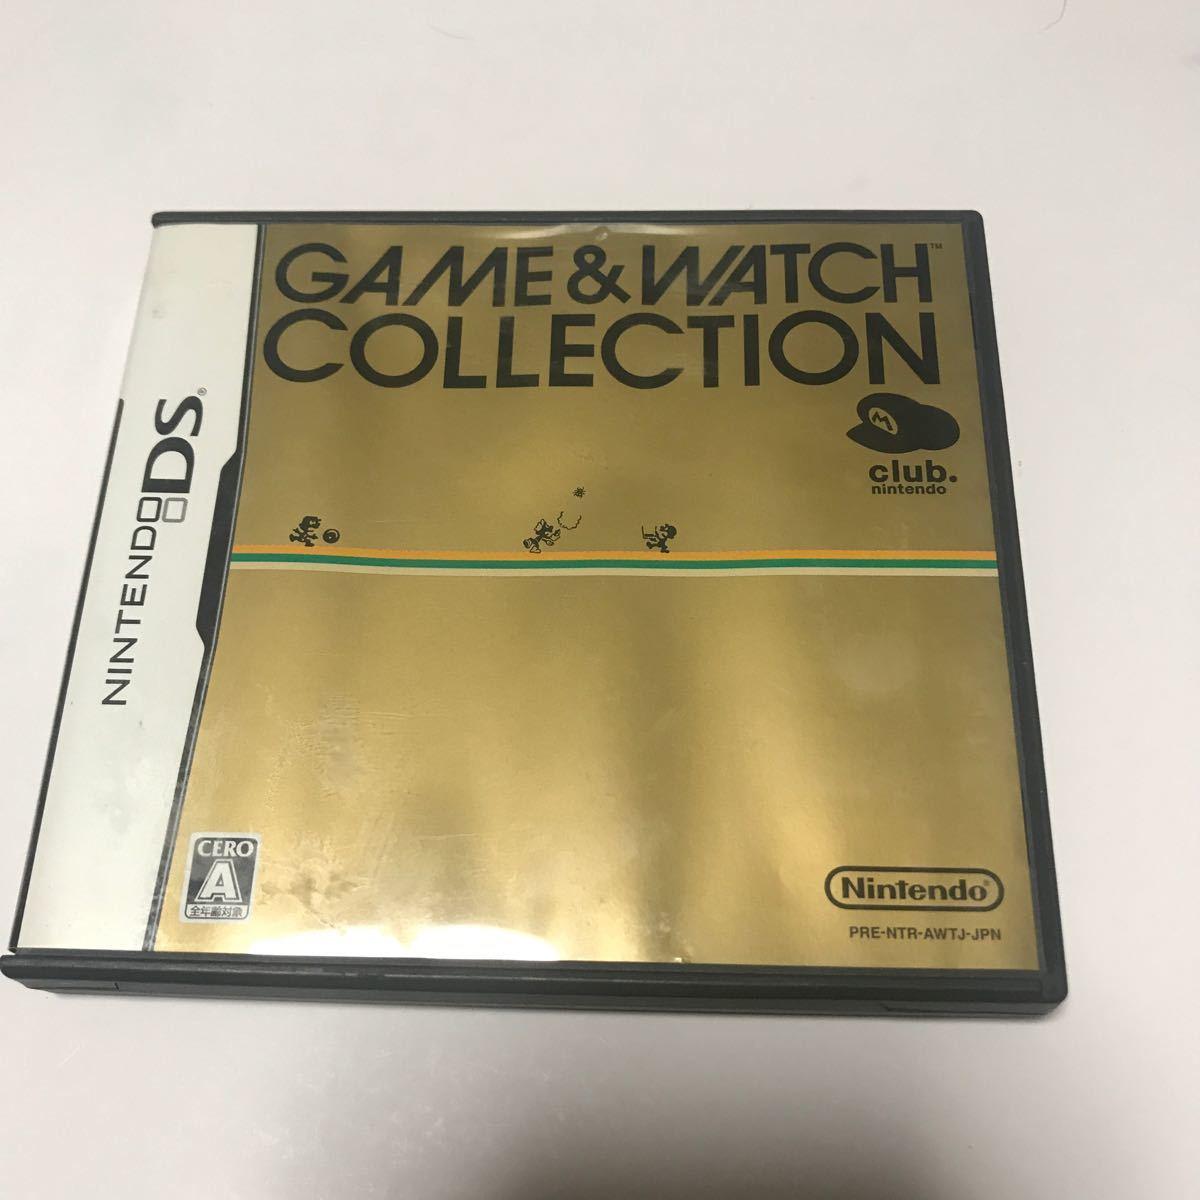 DSソフト ゲームウォッチコレクション